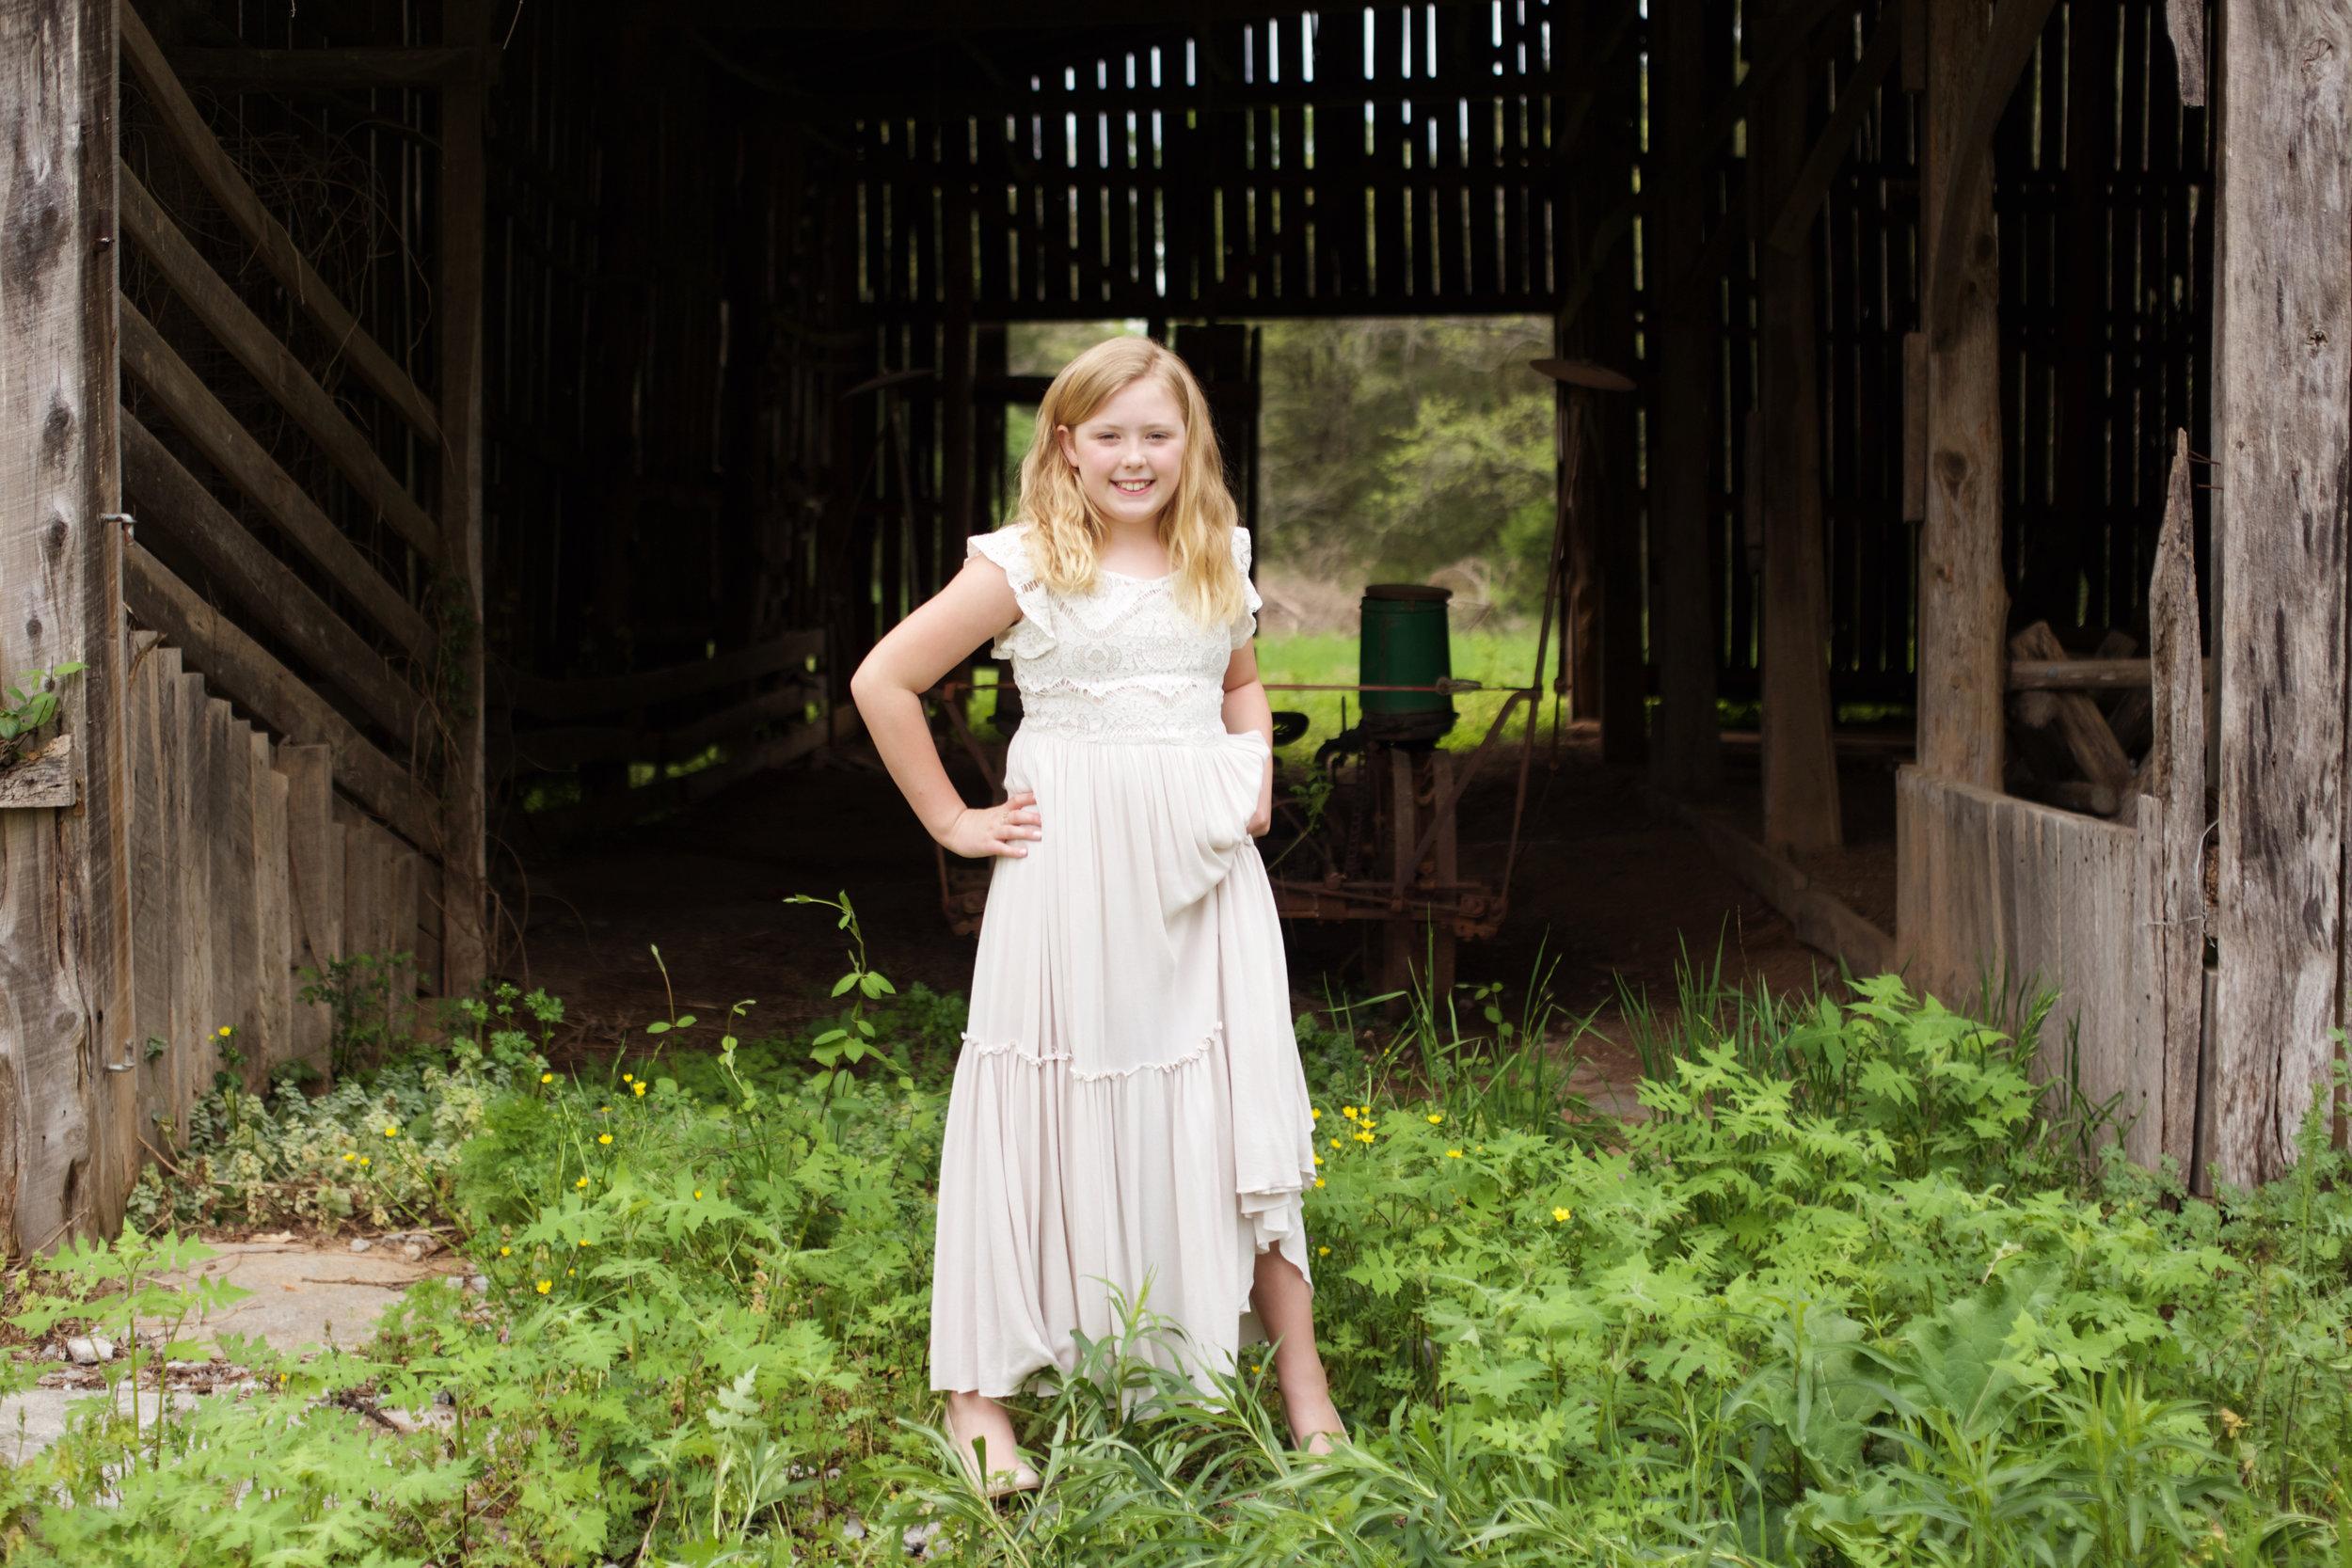 farm-girl.jpg